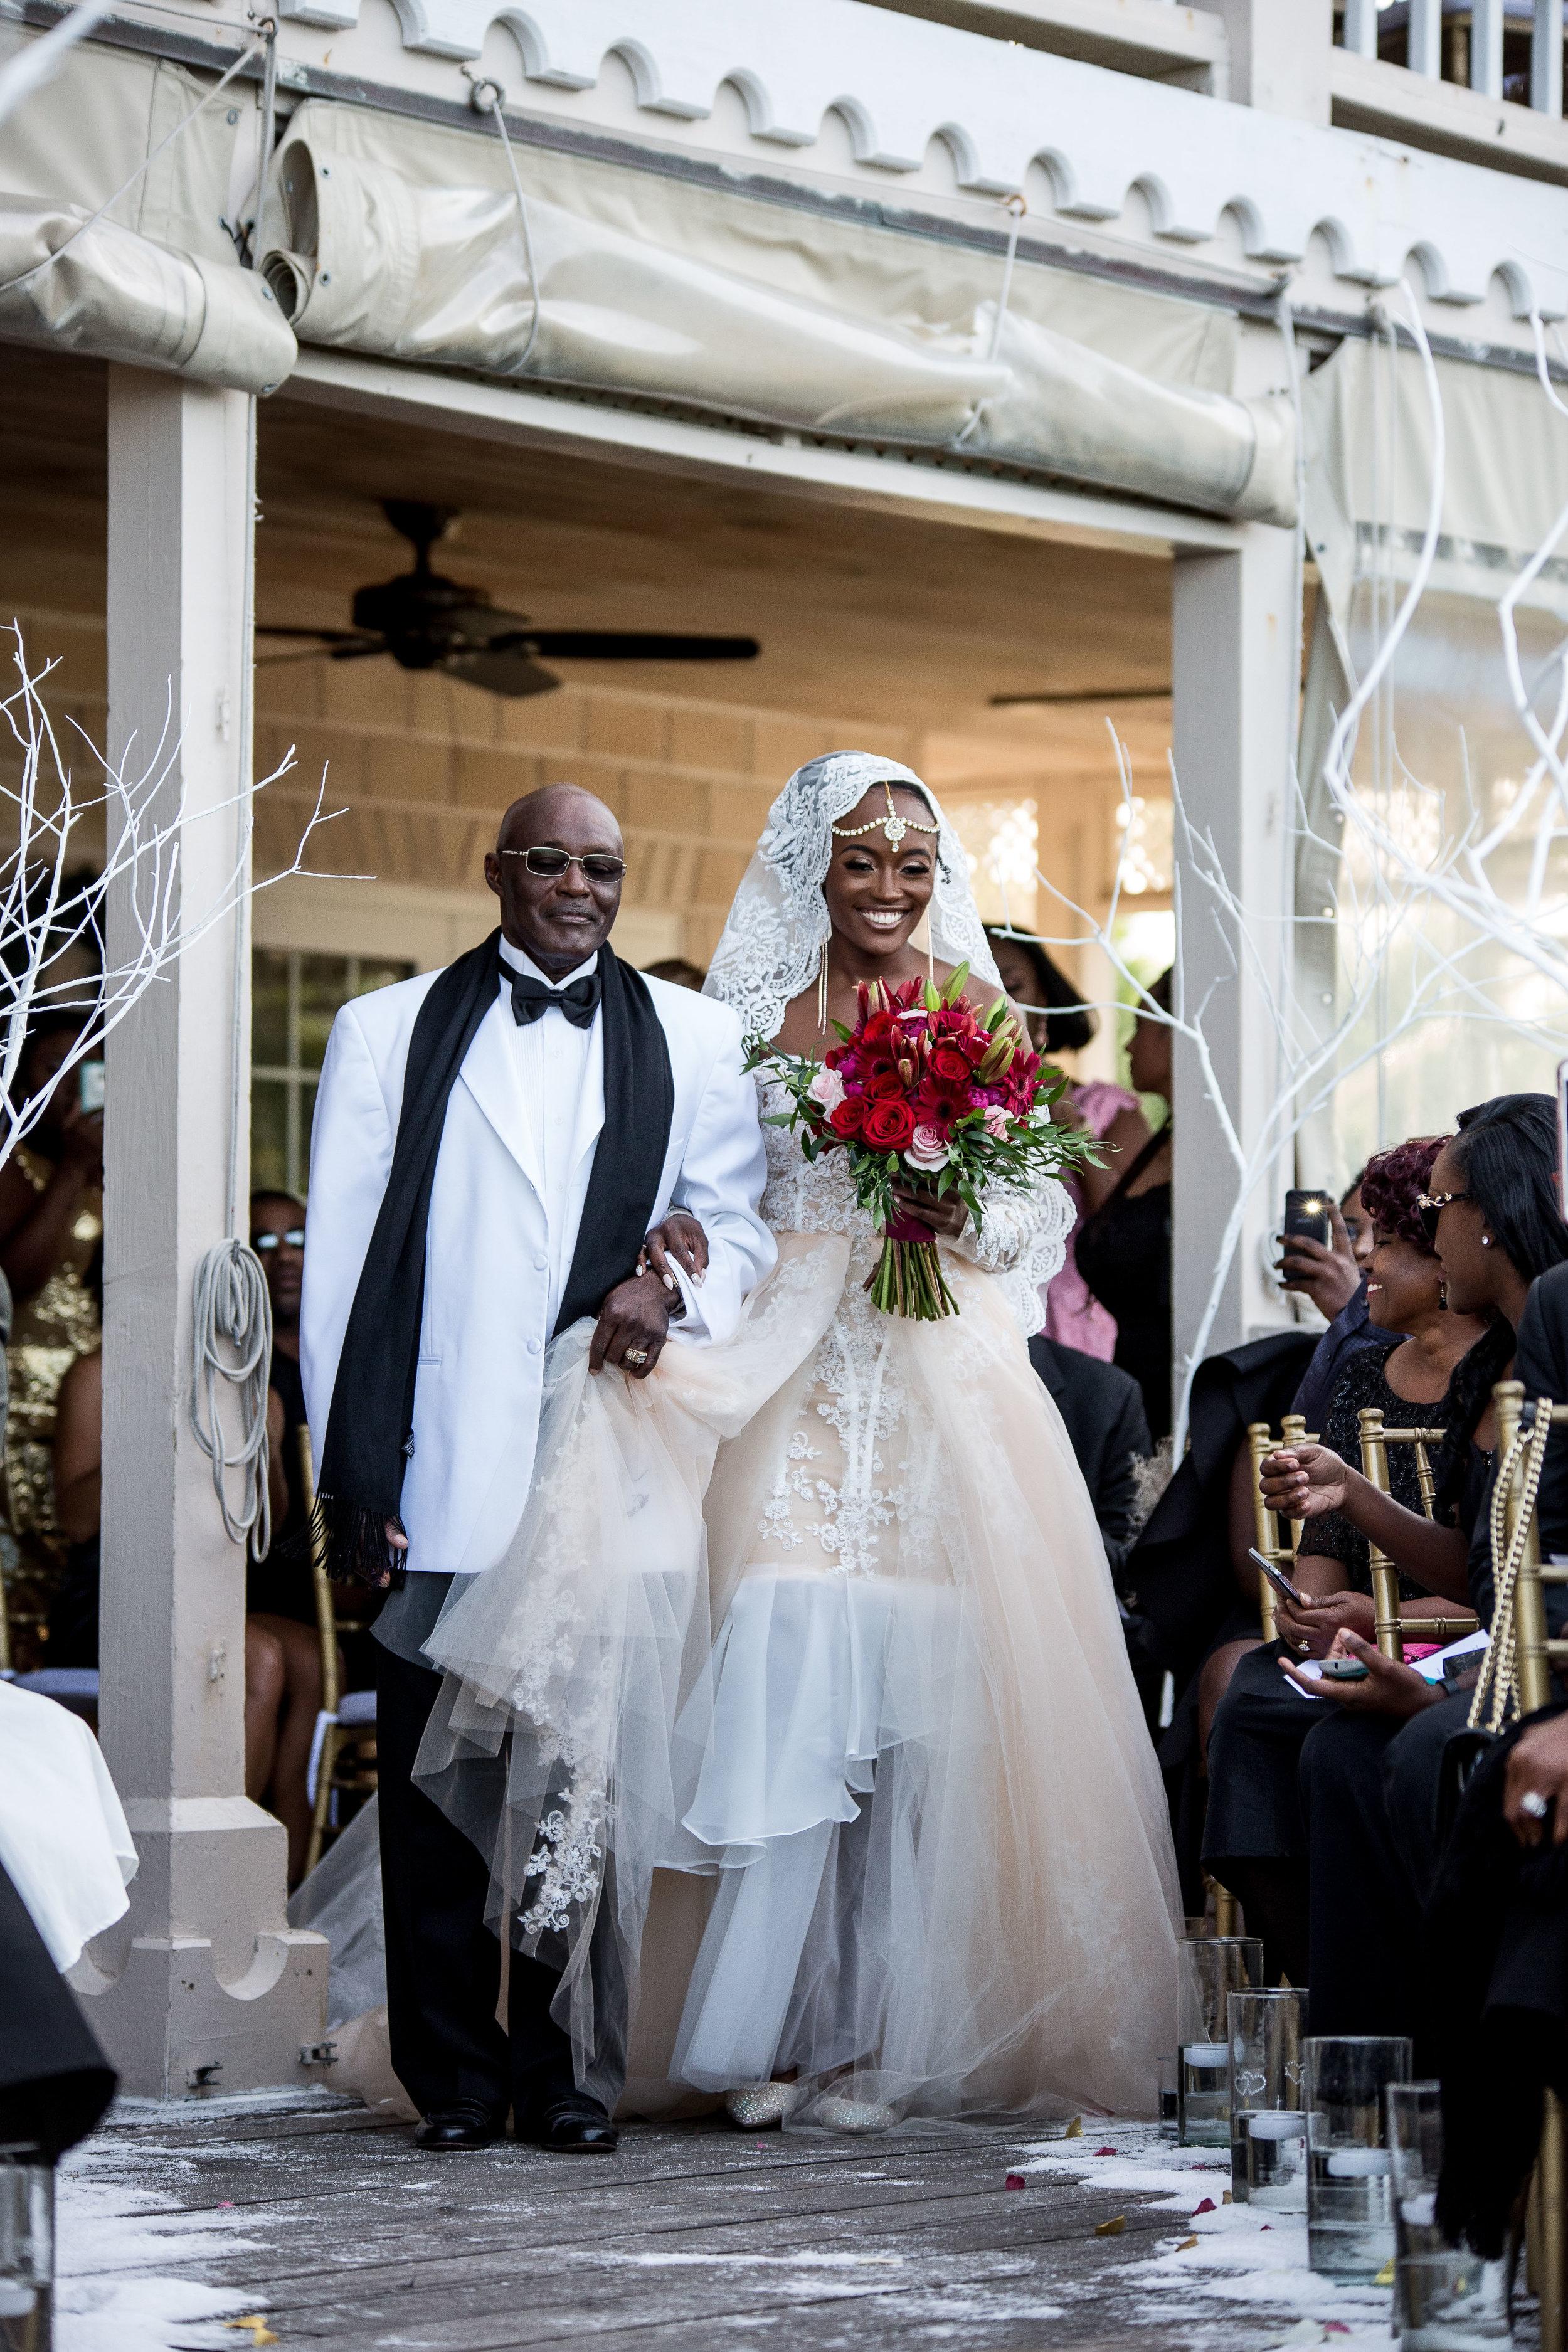 Wedding  (4 of 7).jpg